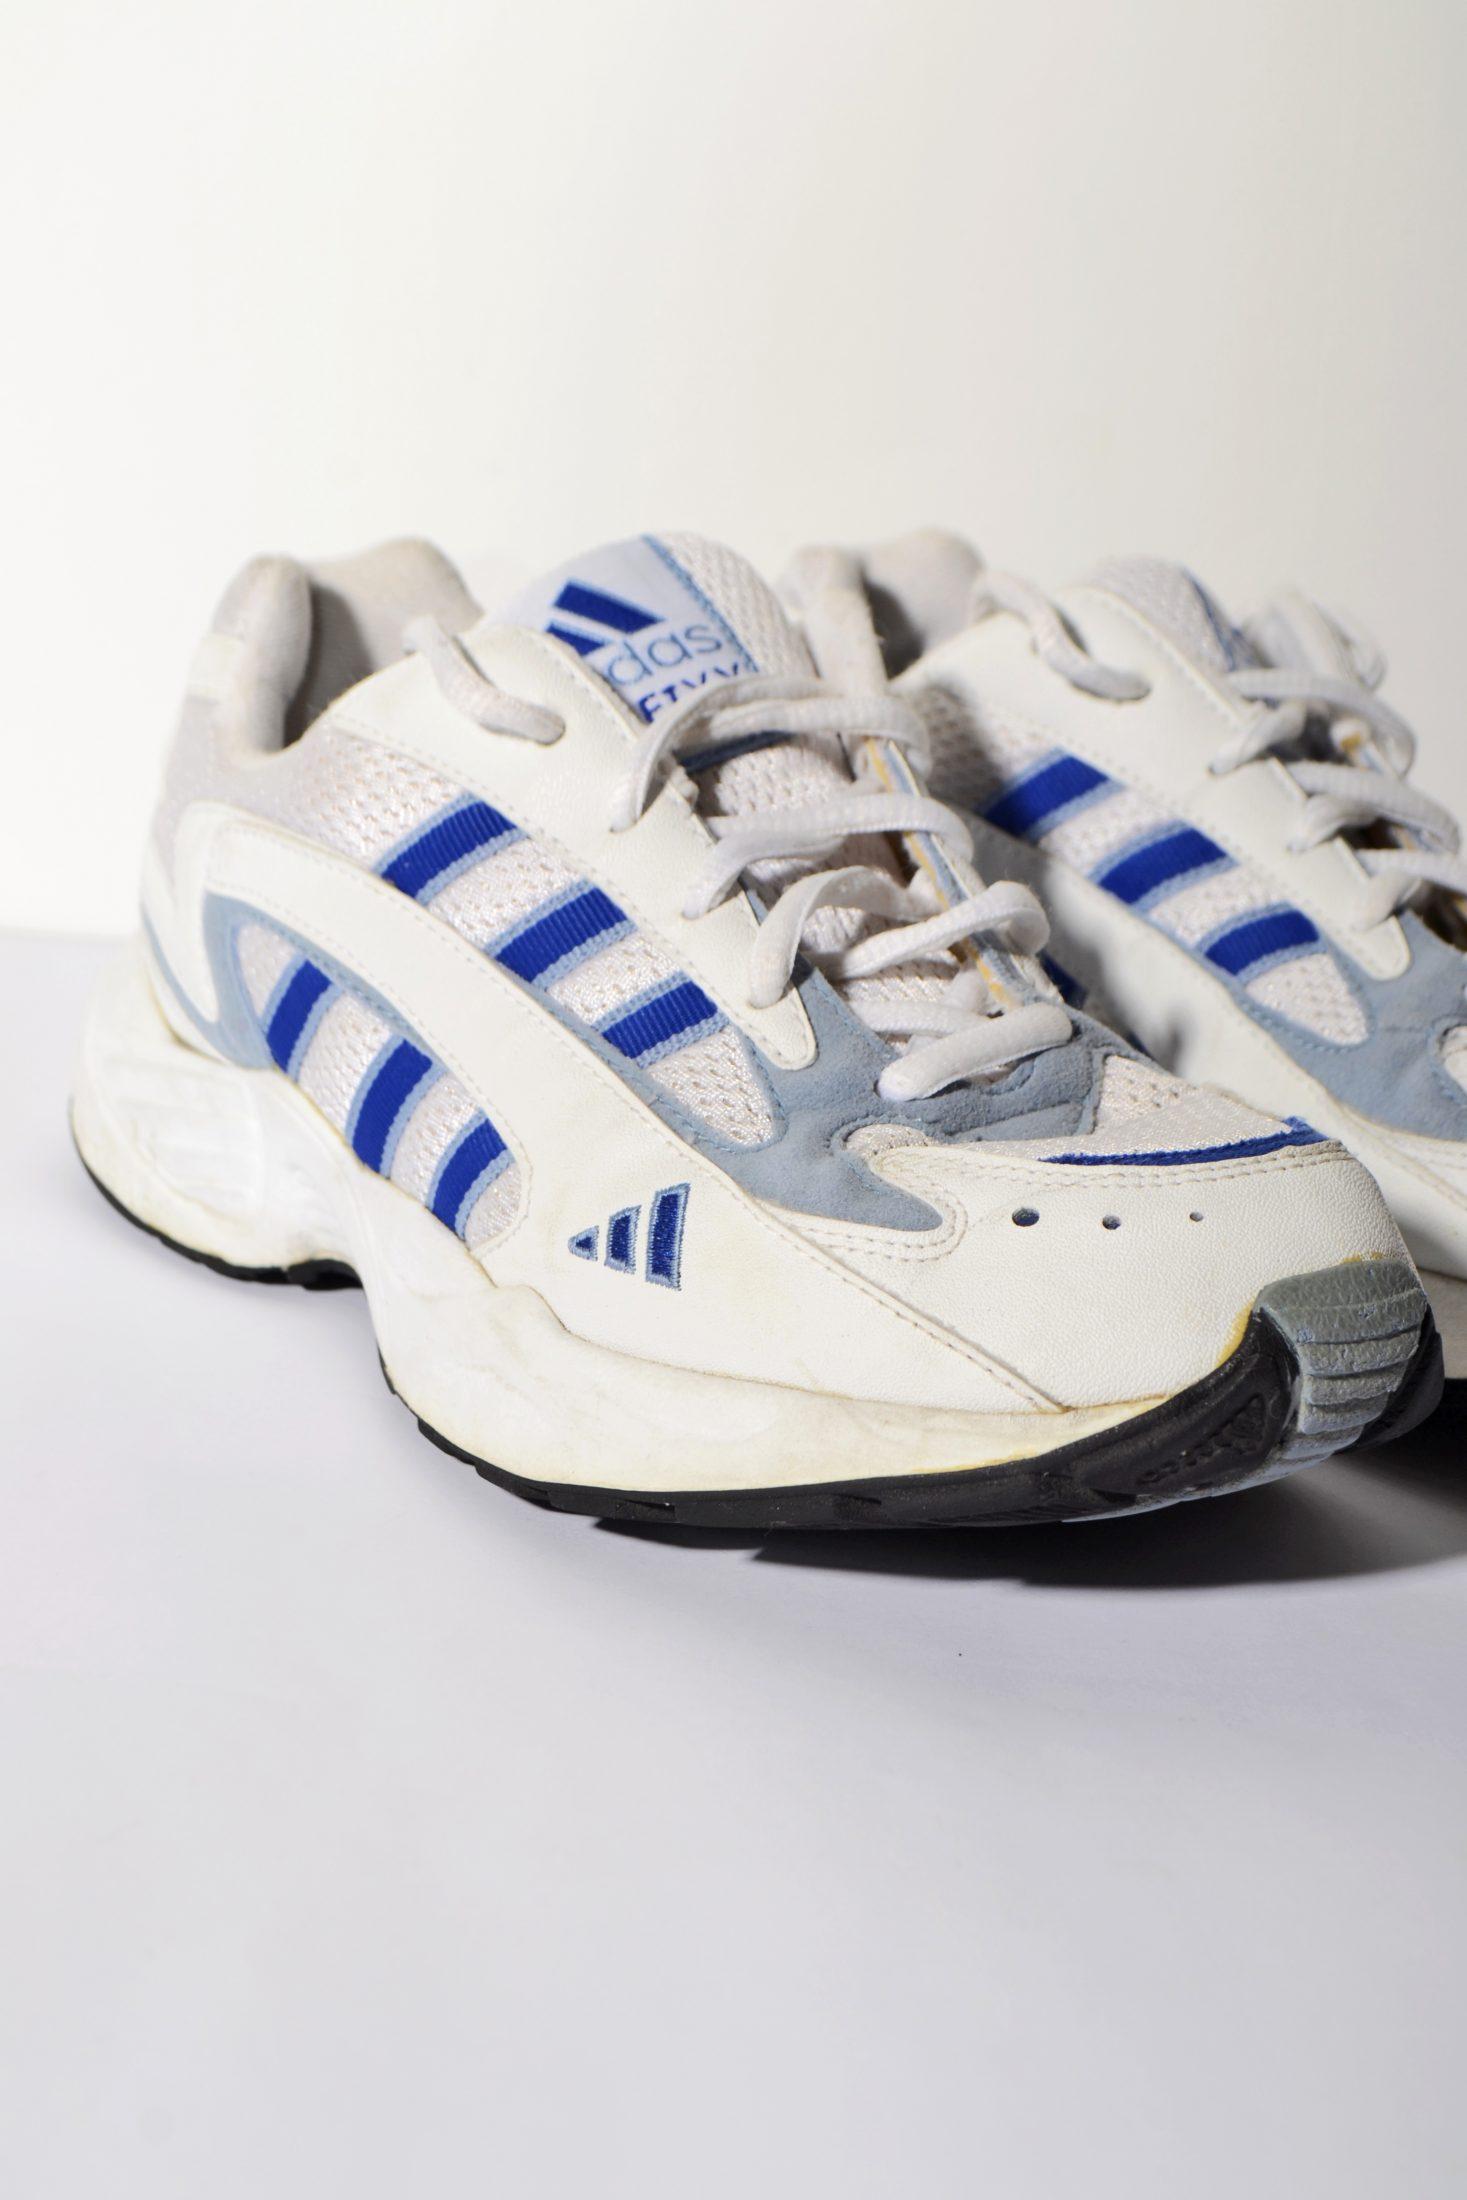 acheter en ligne 4686e 5e97c Adidas Old School trainers | Women's